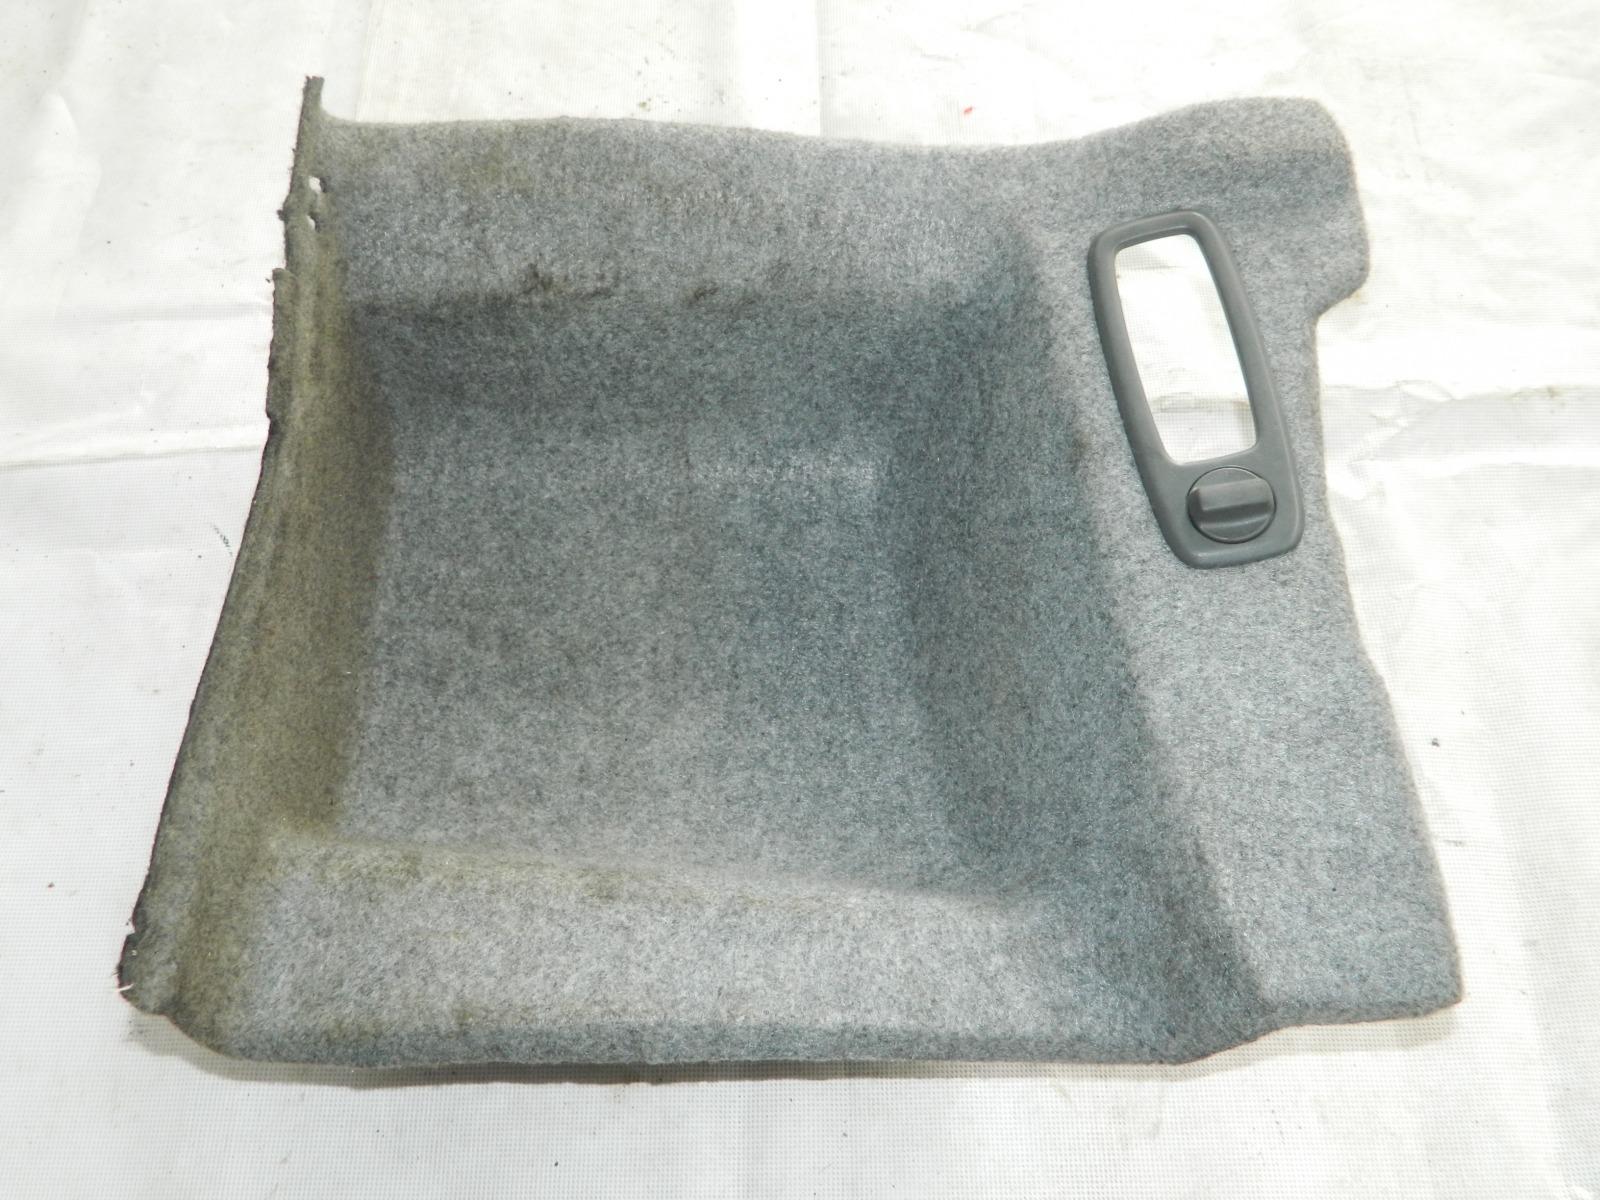 Облицовка багажника Volvo S60 левая (б/у)